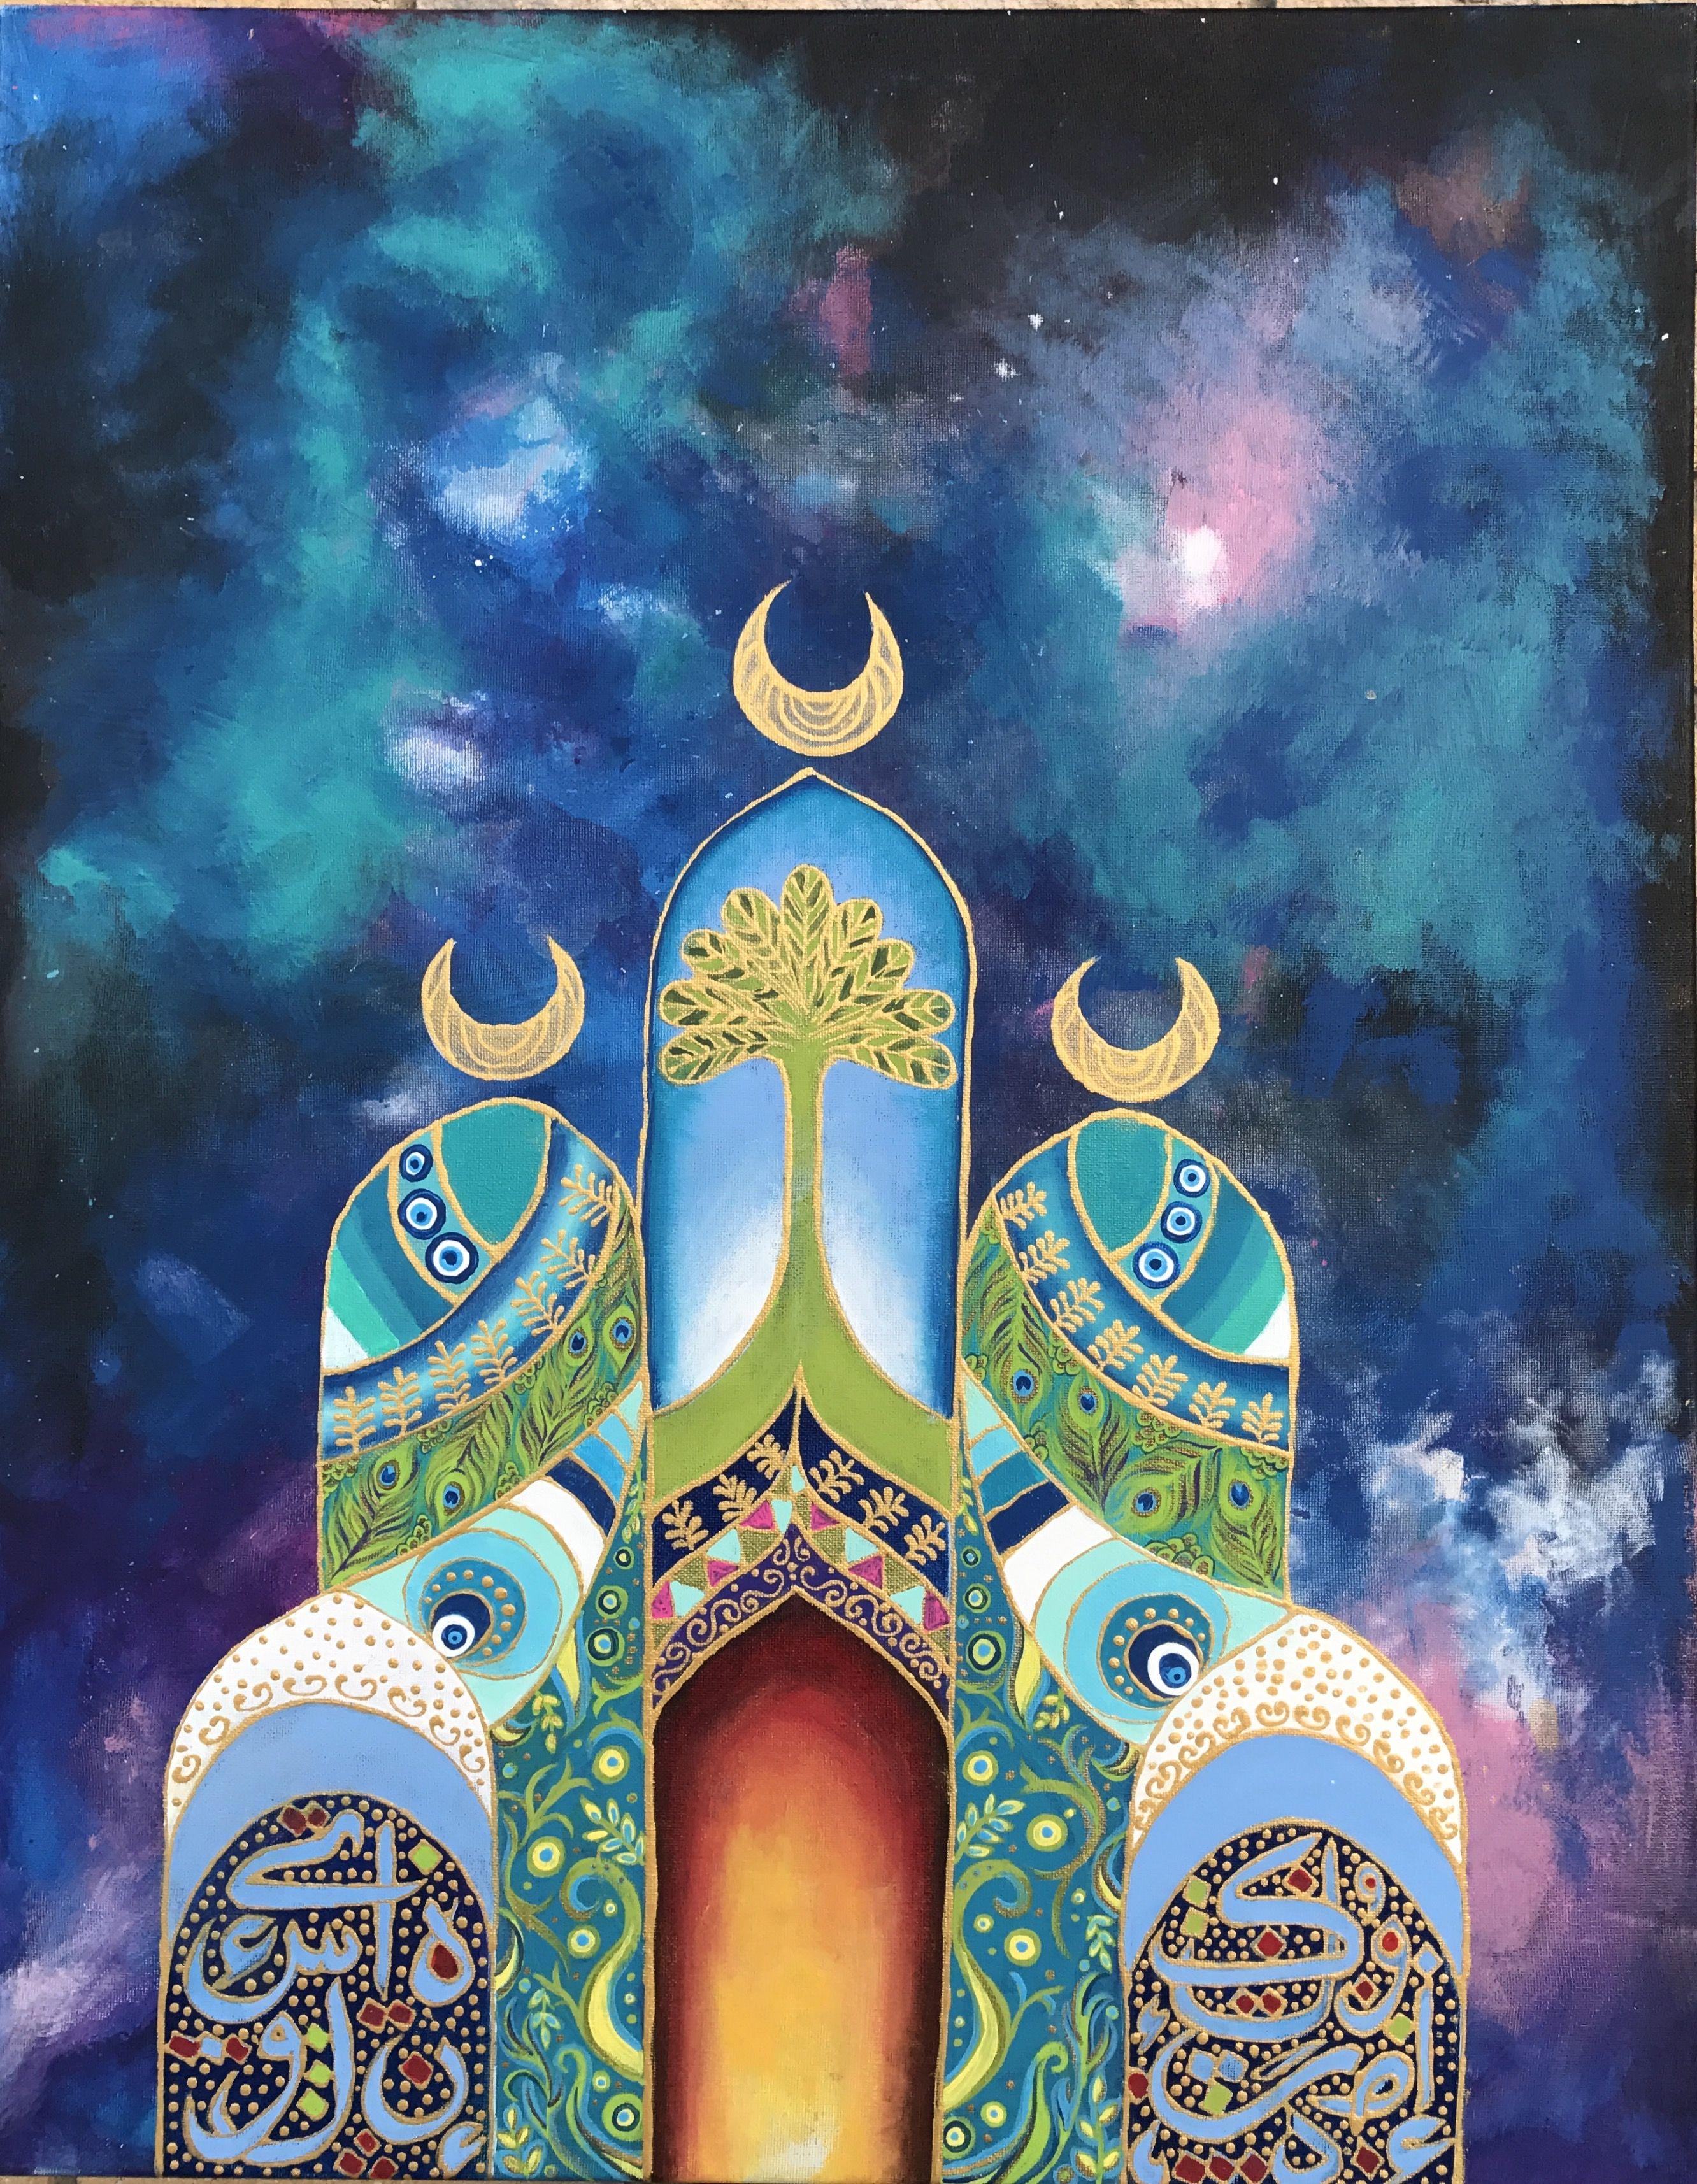 فن تشكيلي عراقي رسومات Cubist Art Mosque Art Islamic Art